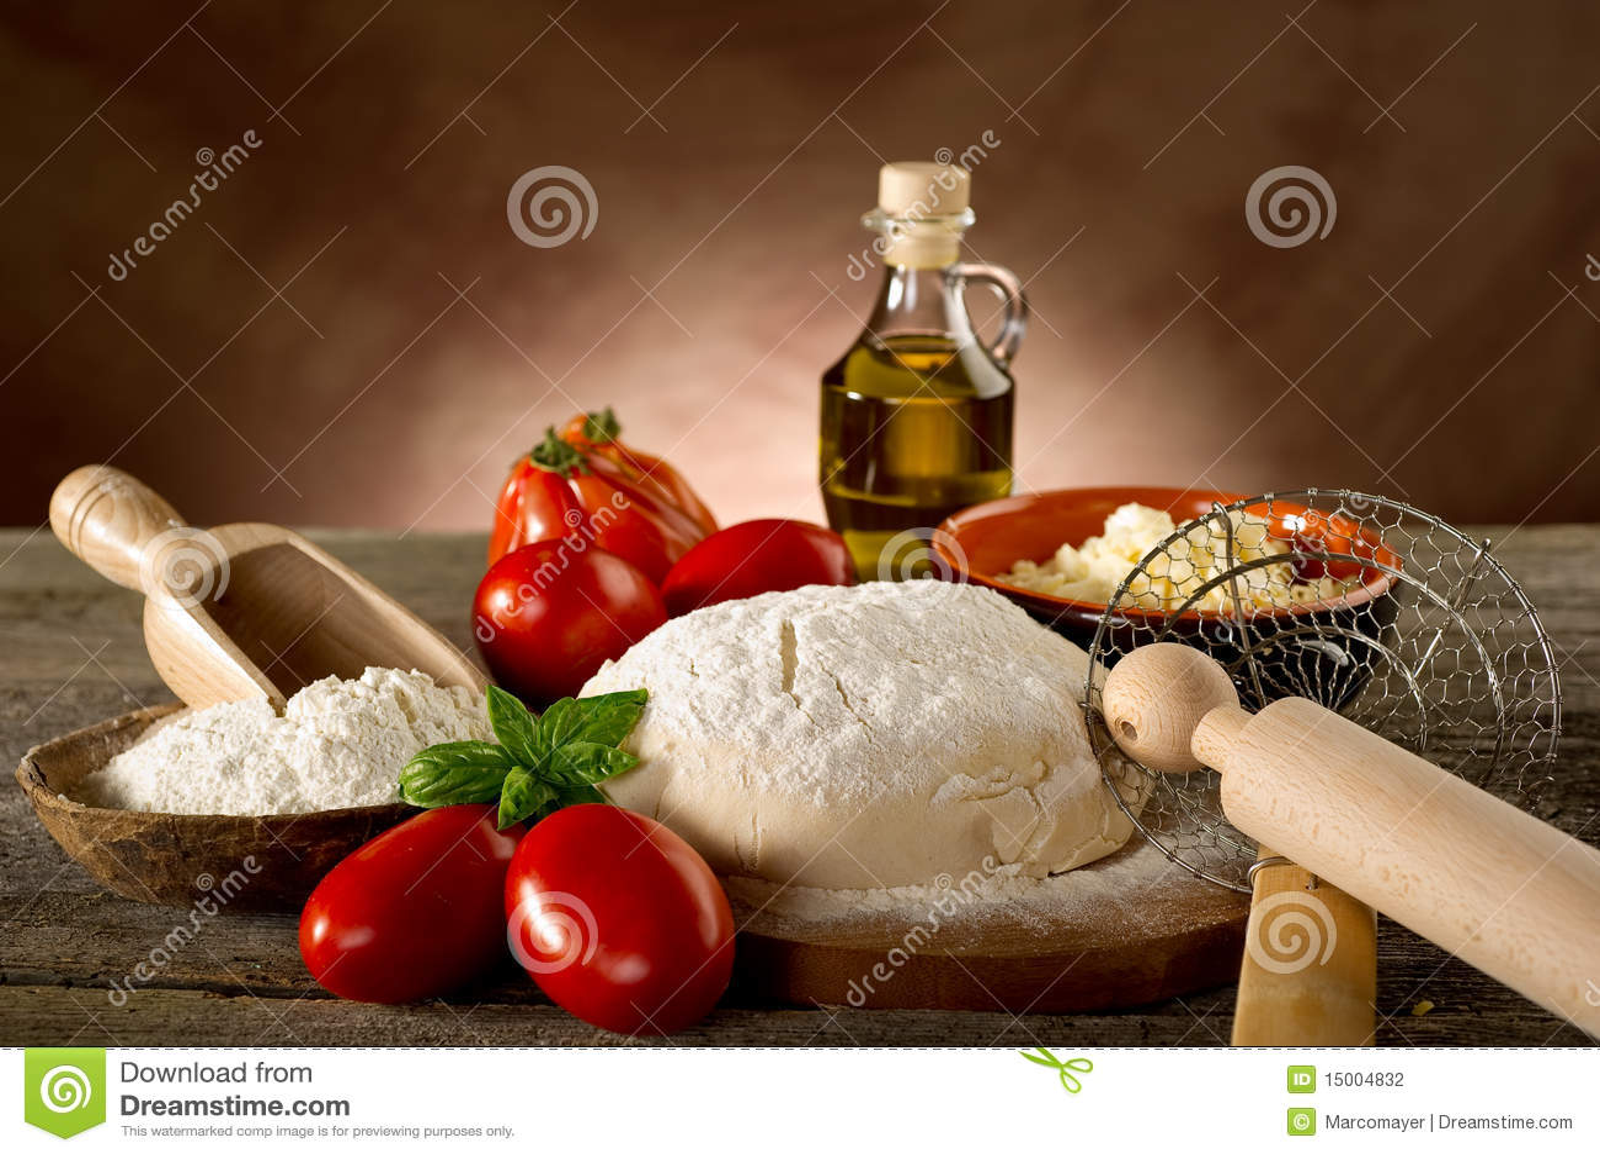 Ingredienti per pizza casalinga fotografia stock immagine di forno cucina 15004832 - Cucina casalinga per cani dosi ...